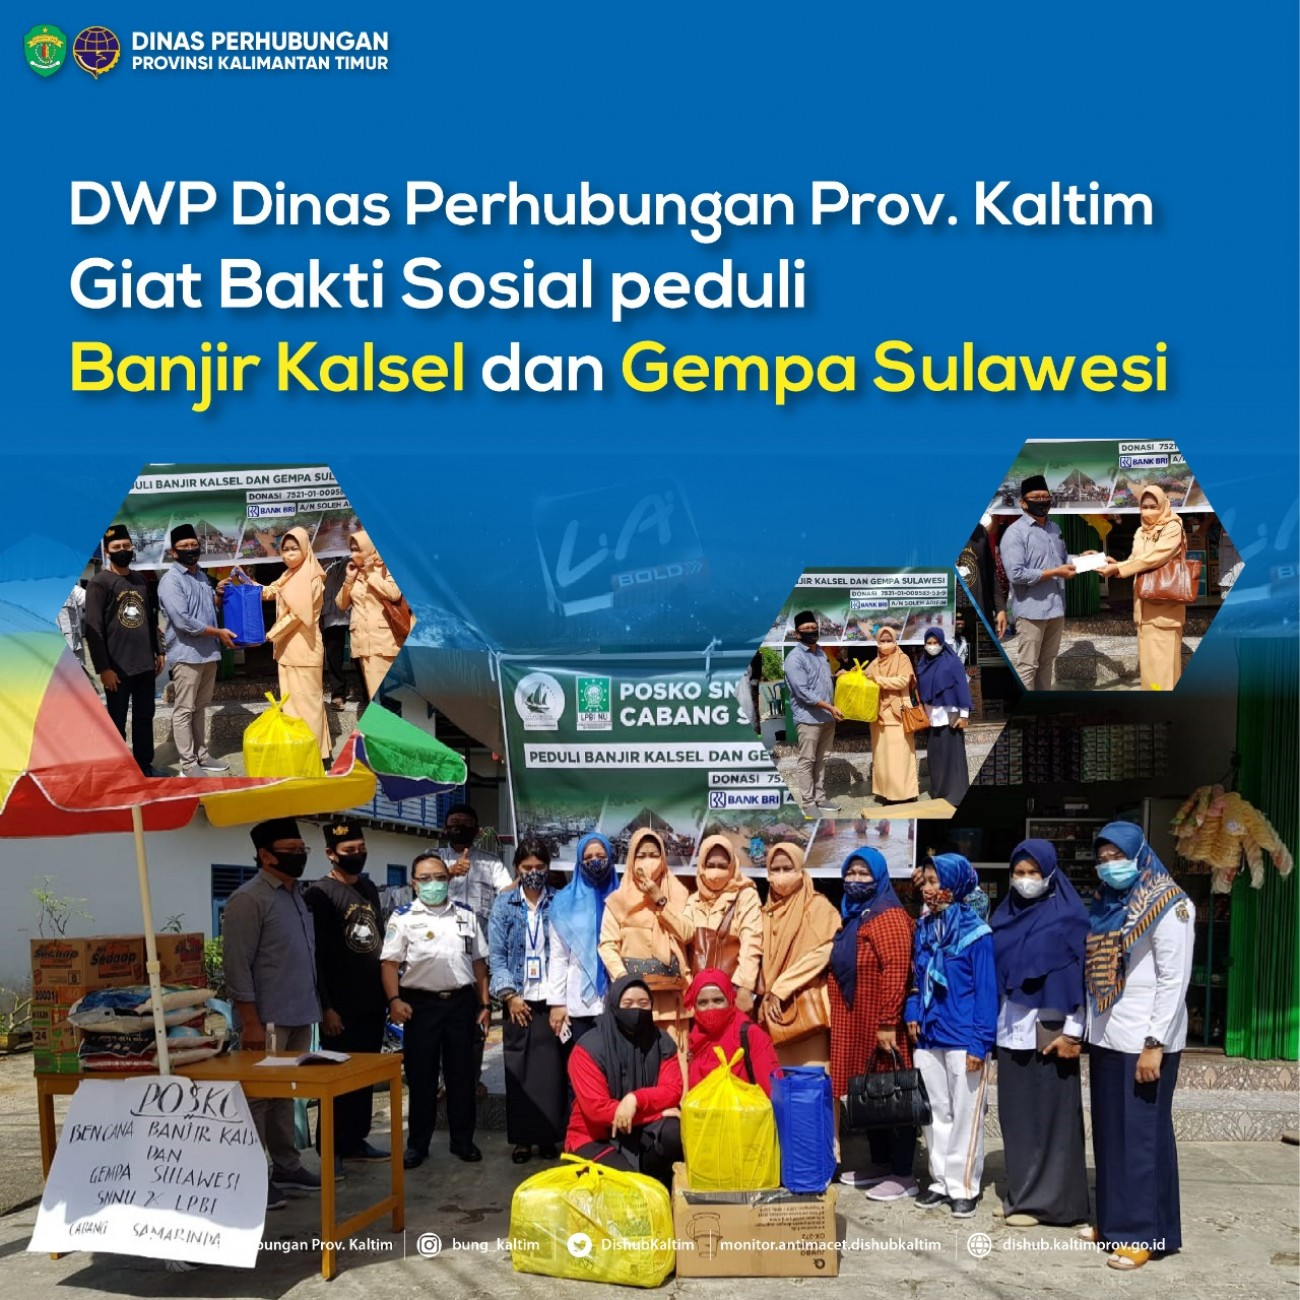 DWP Dinas Perhubungan Prov. Kaltim giat Bakti Sosial peduli banjir Kalsel dan gempa Sulawesi